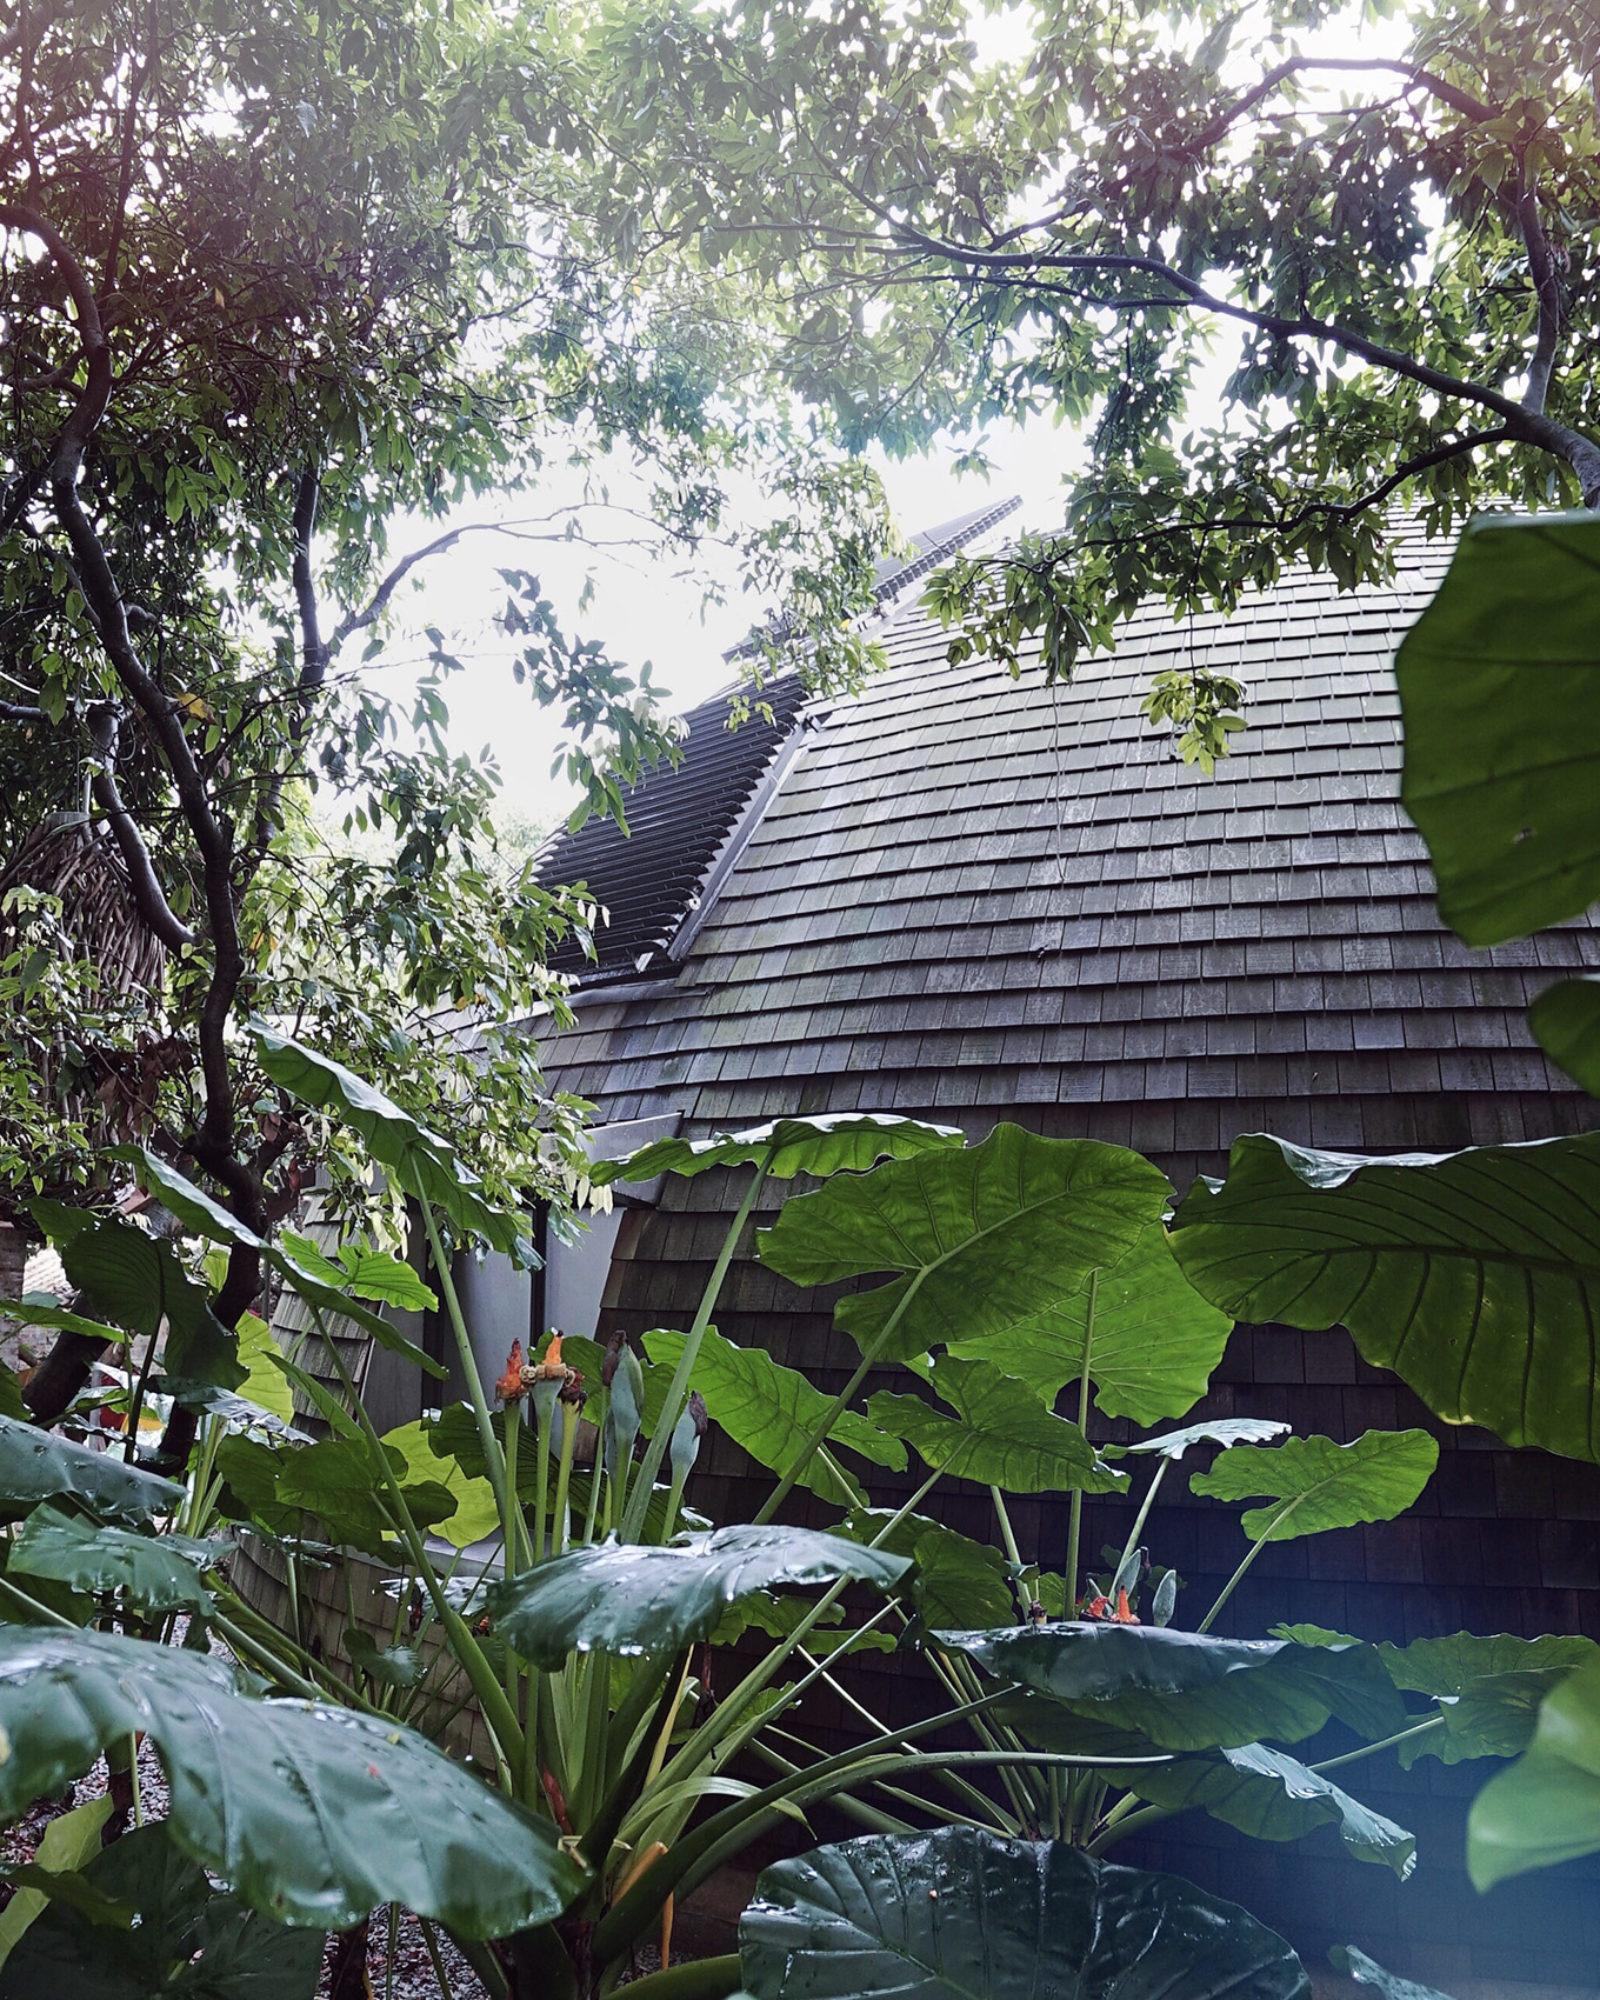 BLEU-NATURE-halo-dome-jungle-chine